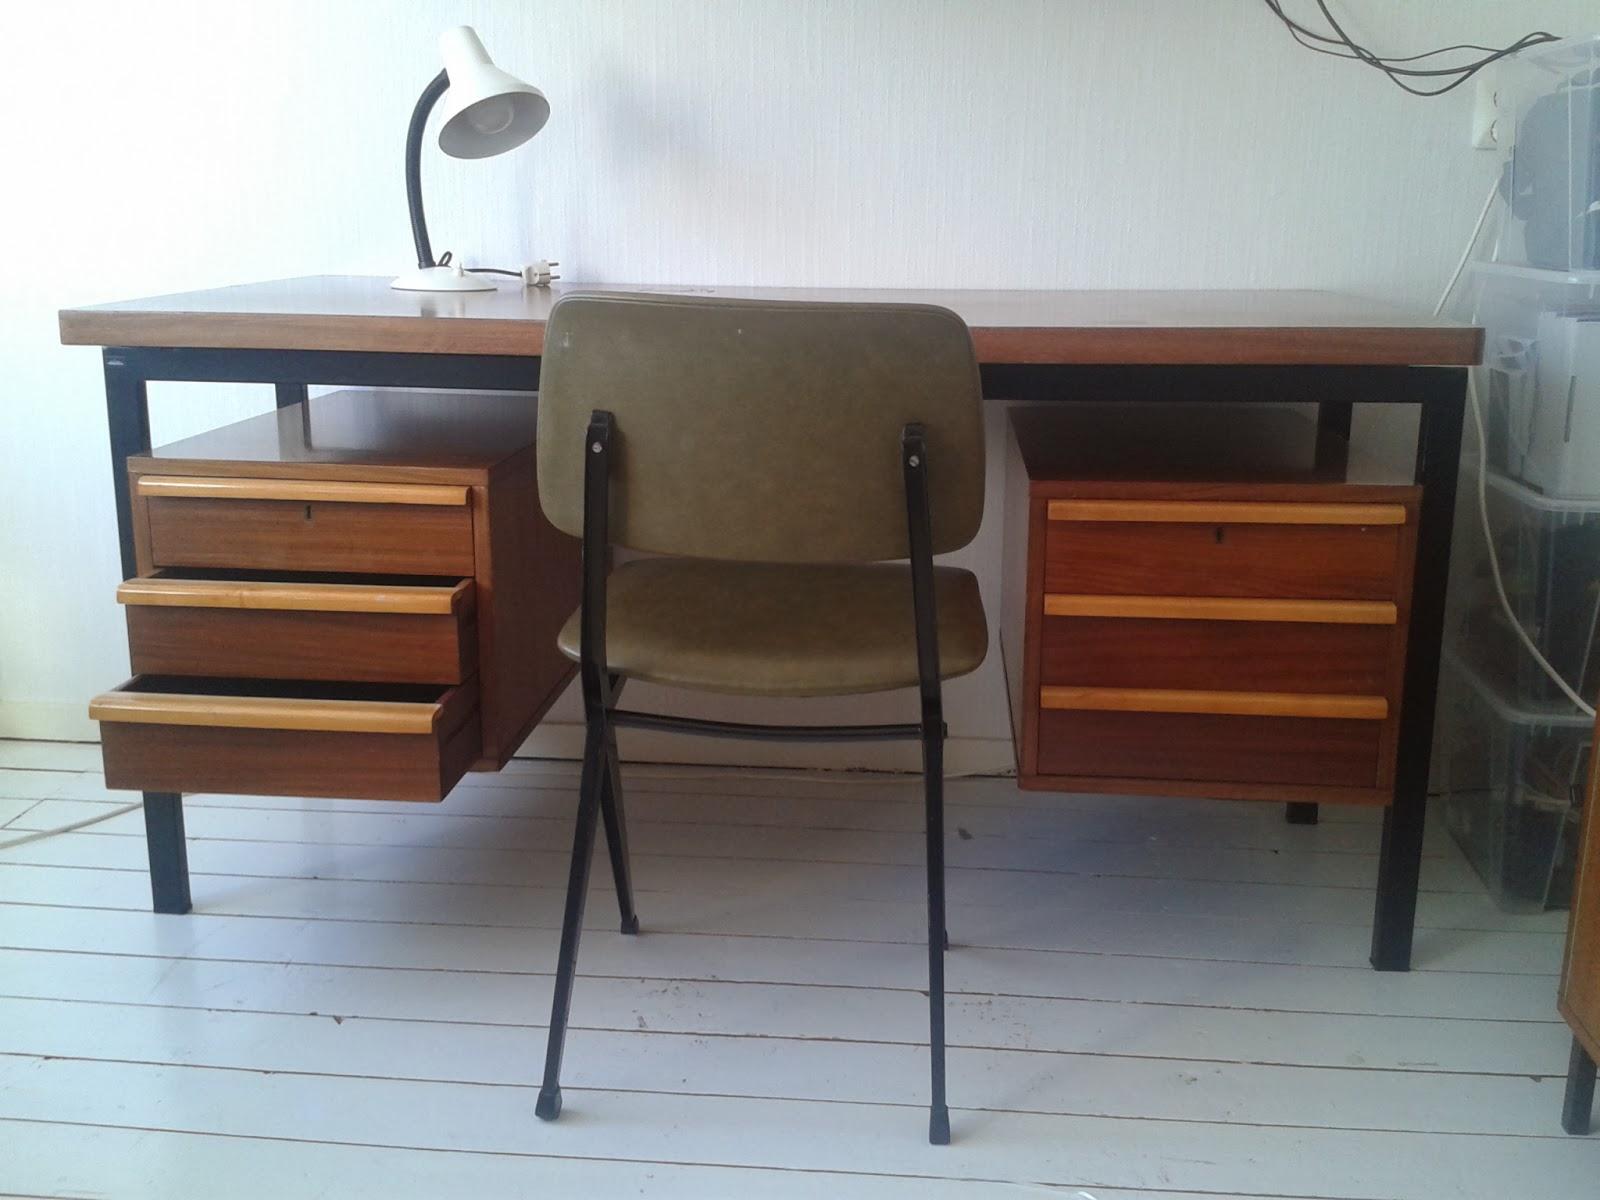 marko retro bureau jaren 60 dutch design desk writing table. Black Bedroom Furniture Sets. Home Design Ideas